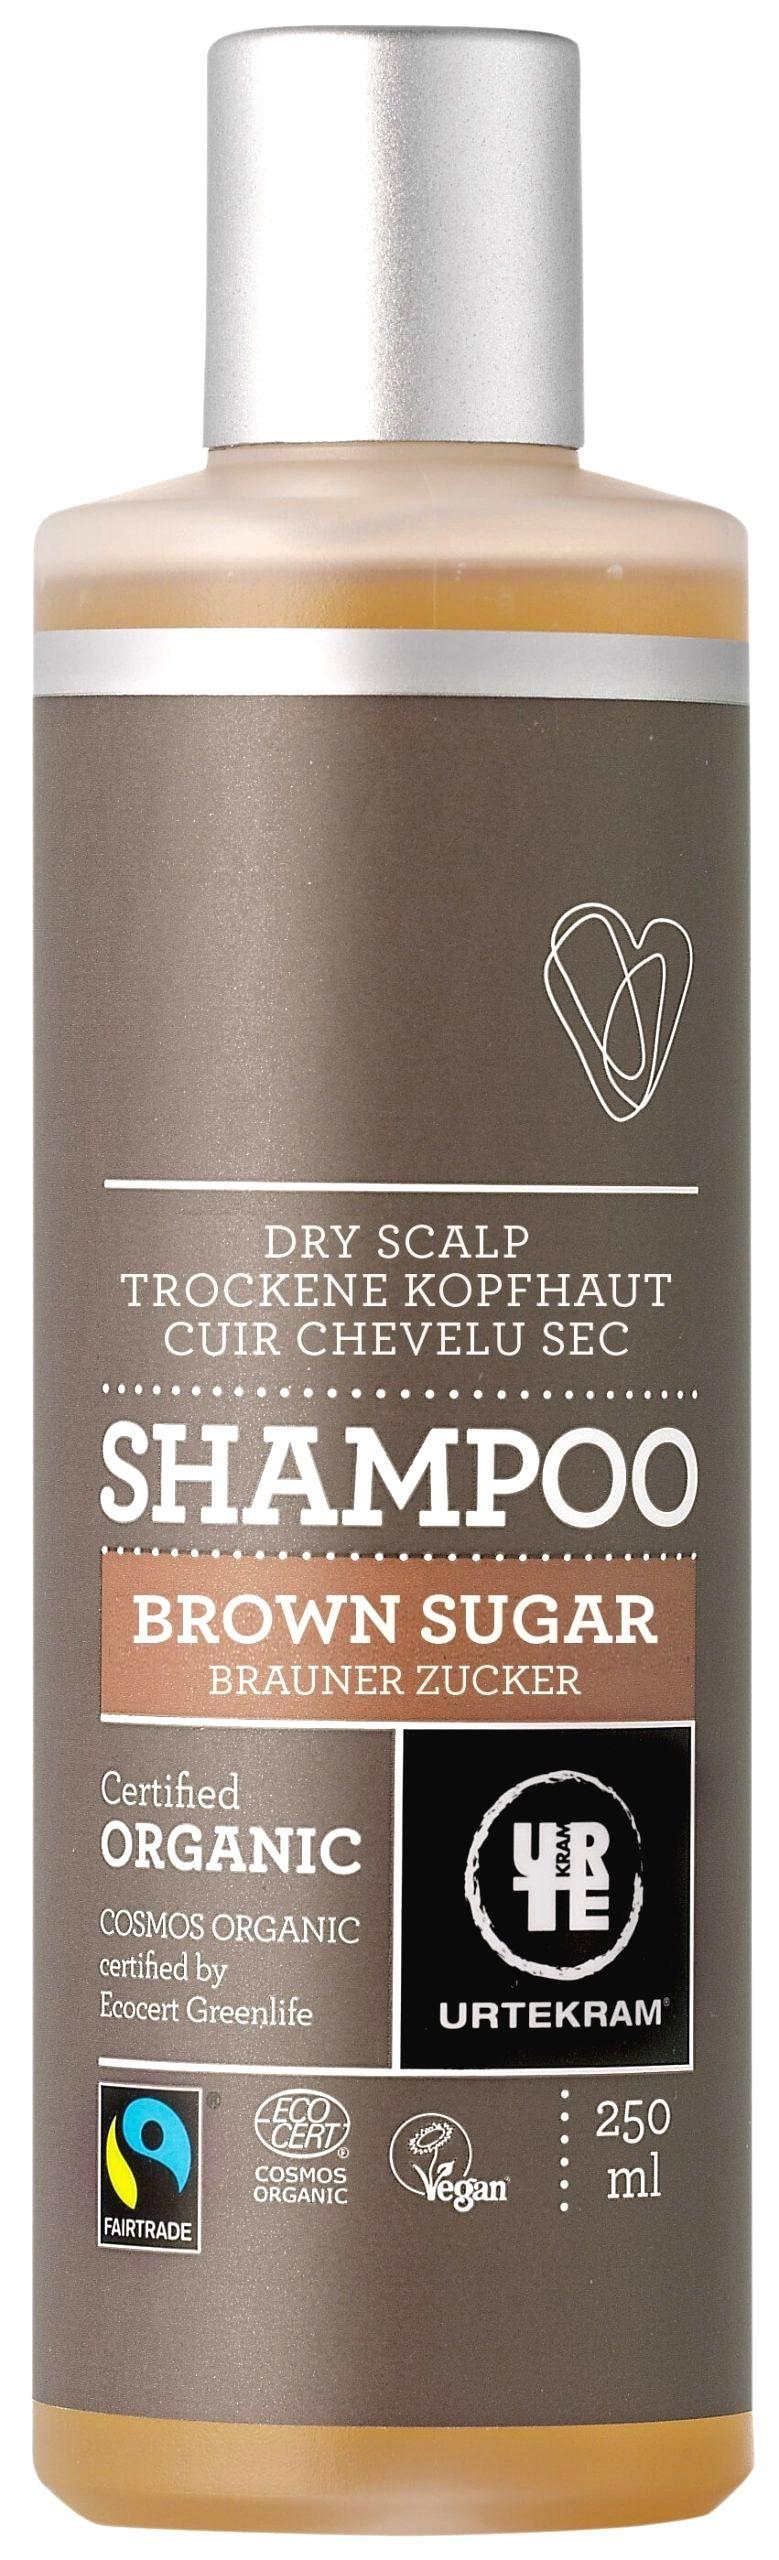 Urtekram Šampón brown sugar 250 ml BIO